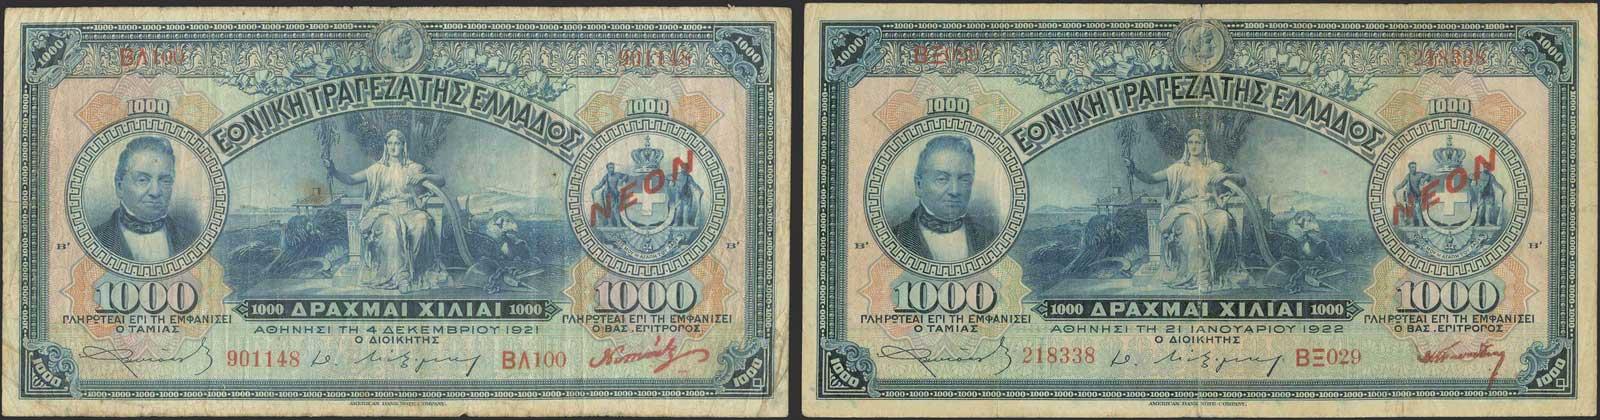 Lot 9272 - GREECE-  PAPER MONEY - BANKNOTES National Bank of Greece -  A. Karamitsos Public & LIVE Bid Auction 610 Coins, Medals & Banknotes